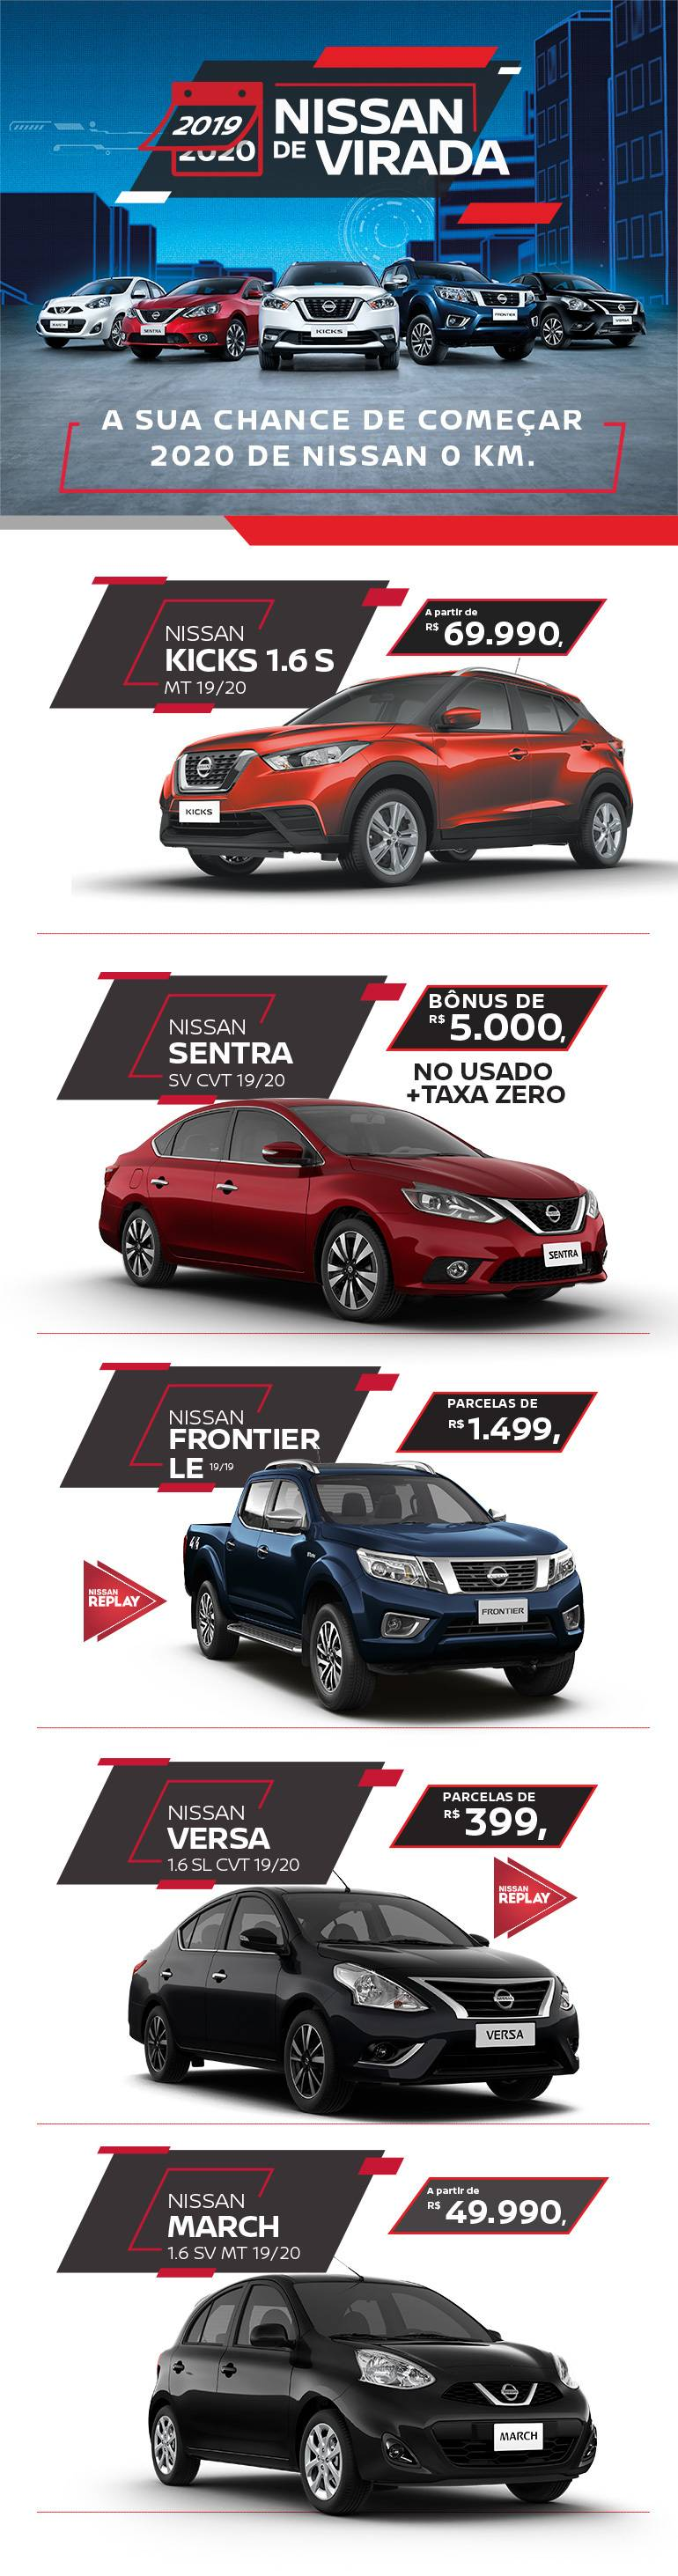 Nissan de Virada